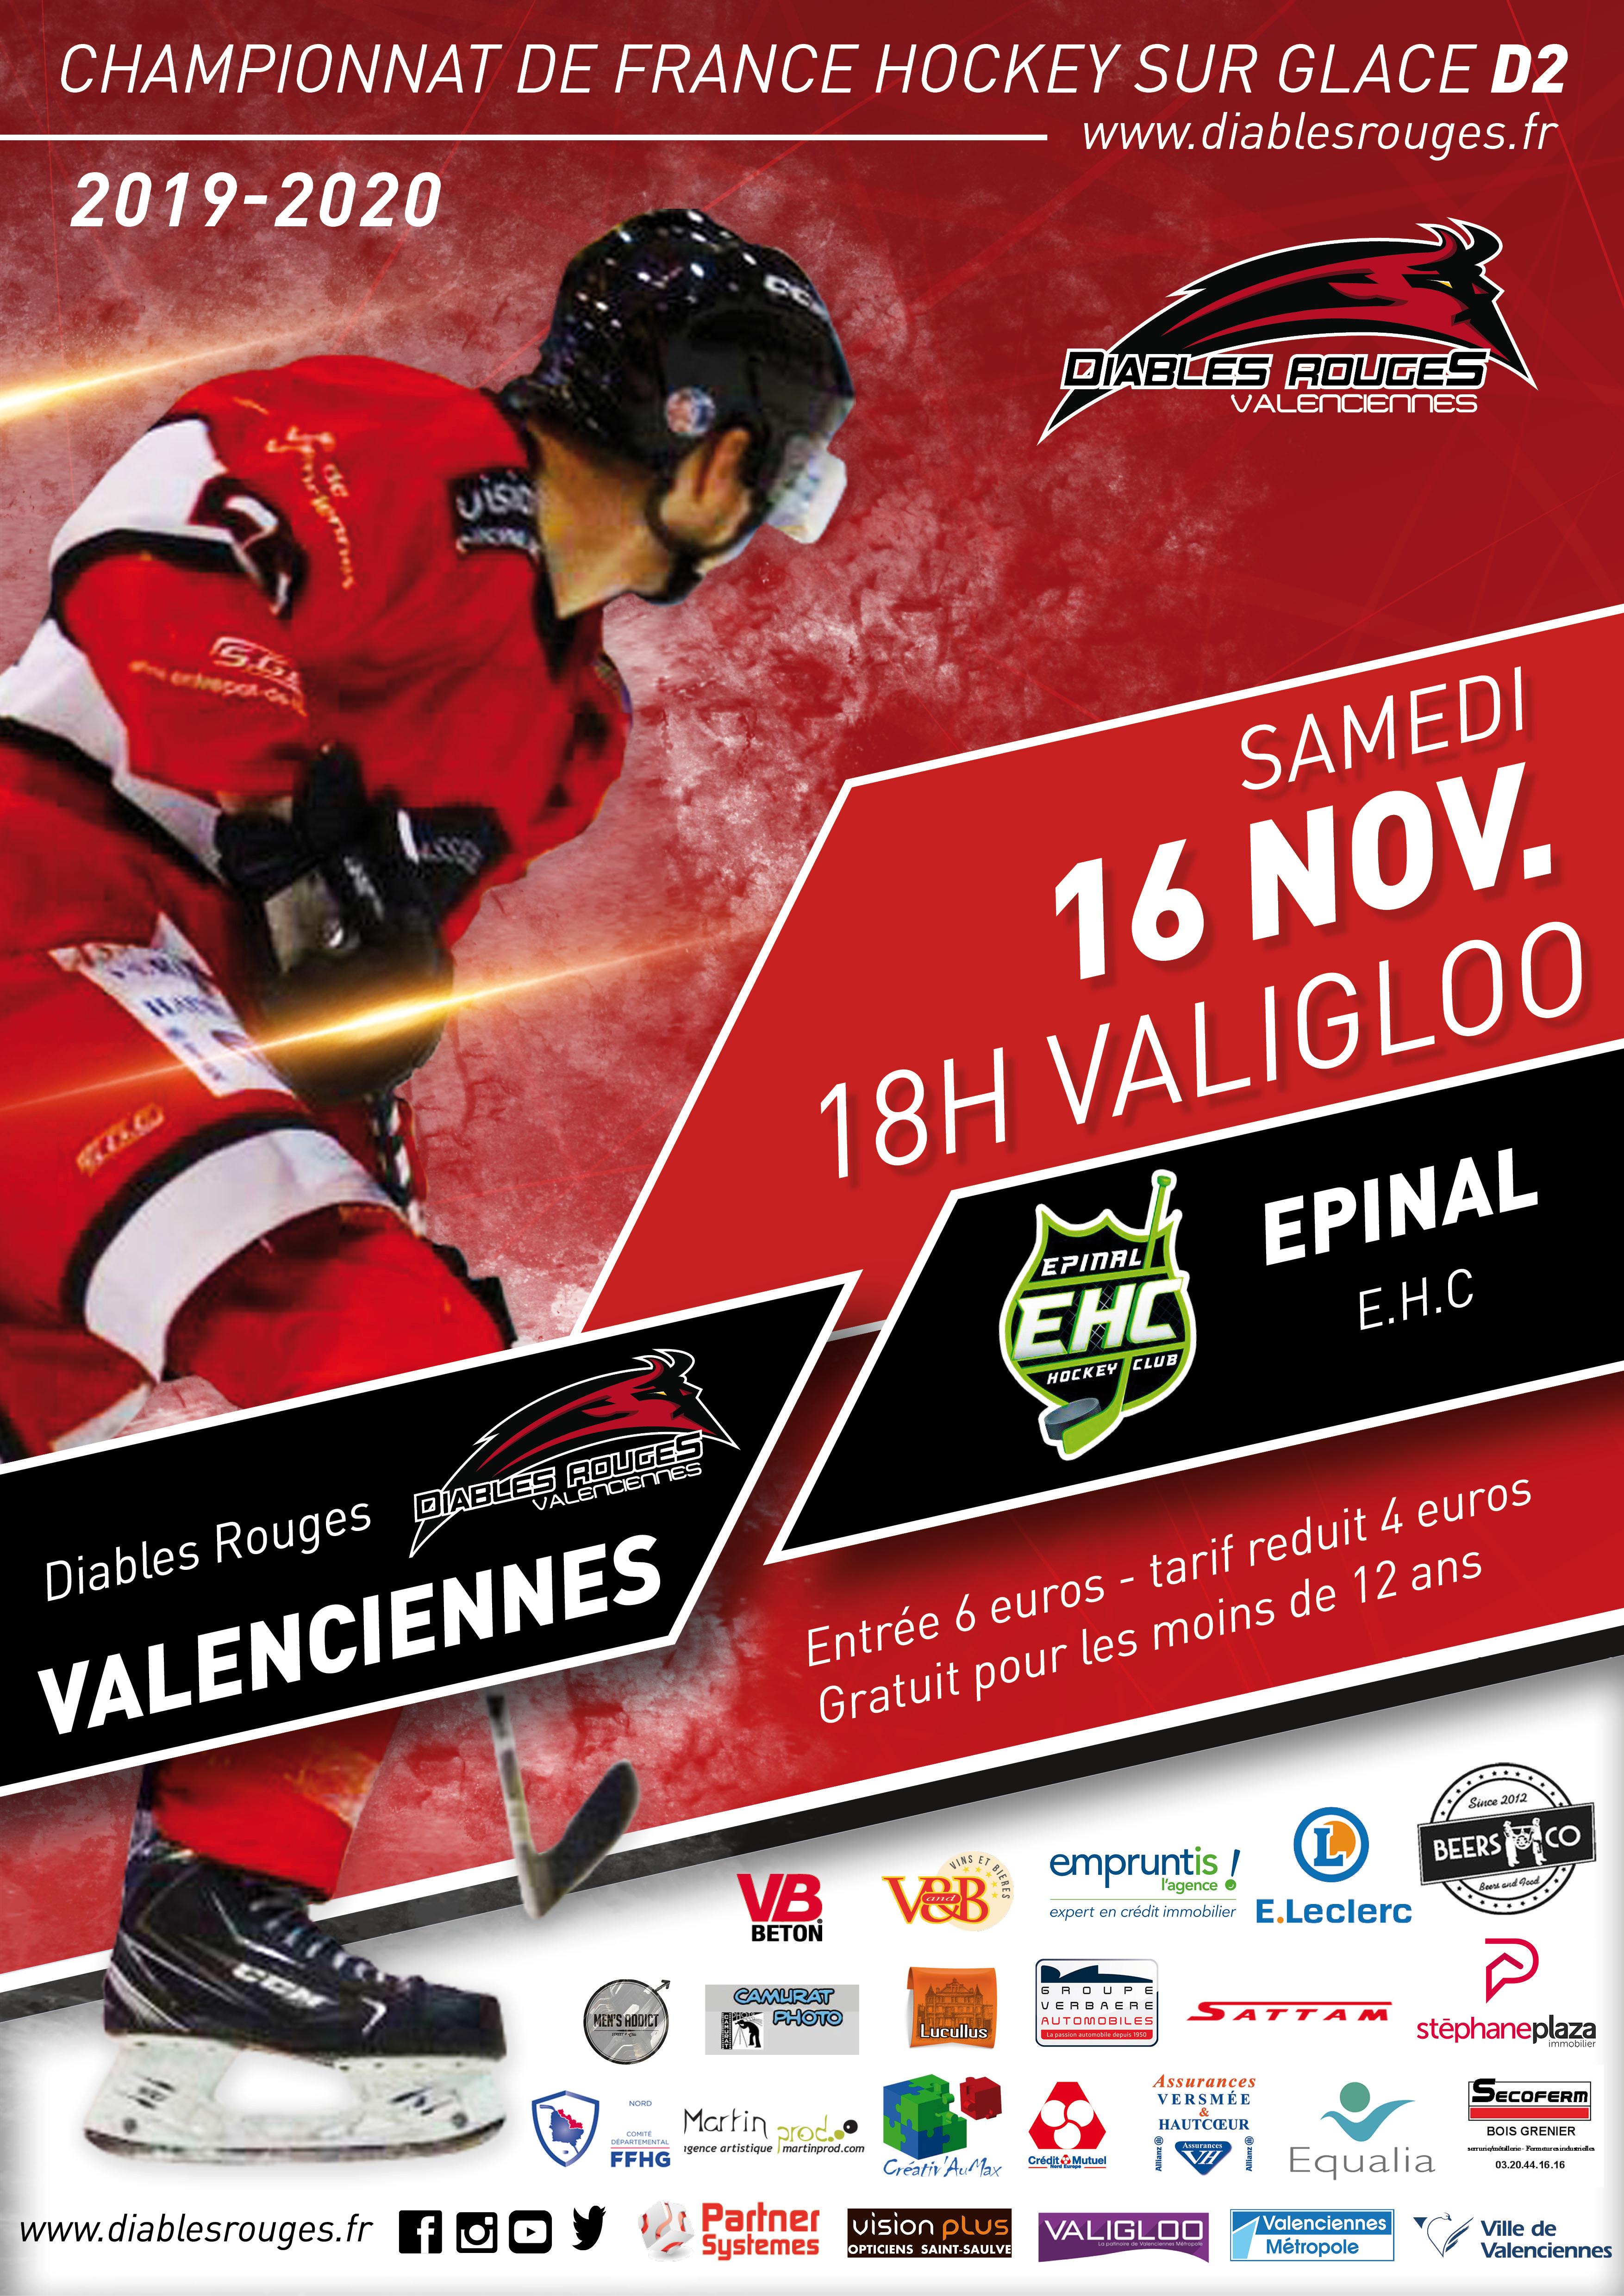 Valenciennes reçoit Epinal ce samedi 16 novembre 2019